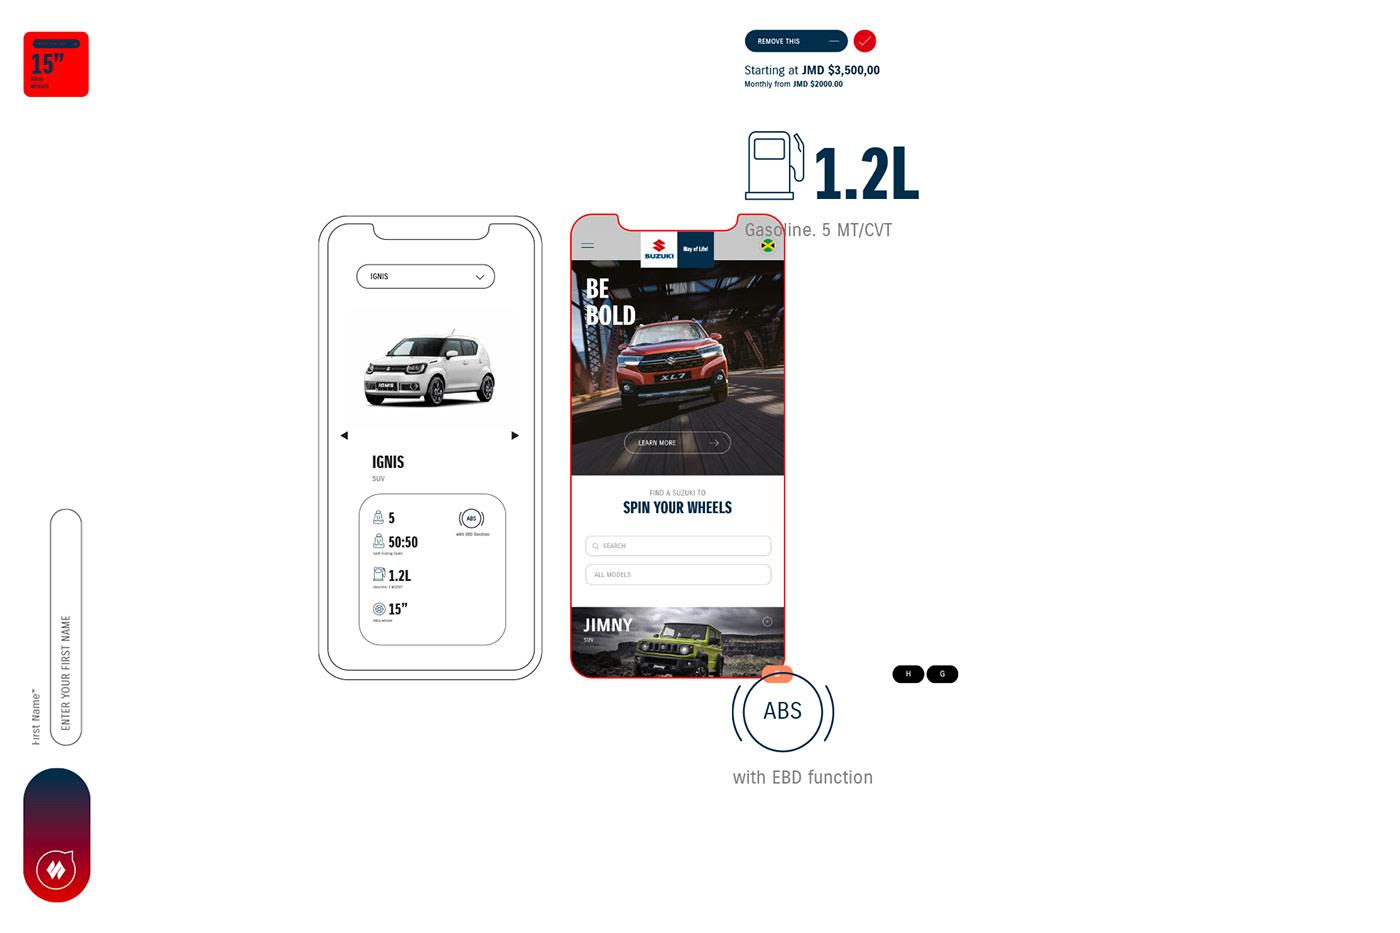 automovile Cars clean digital Engineering  futuristic modern simple Smart tech